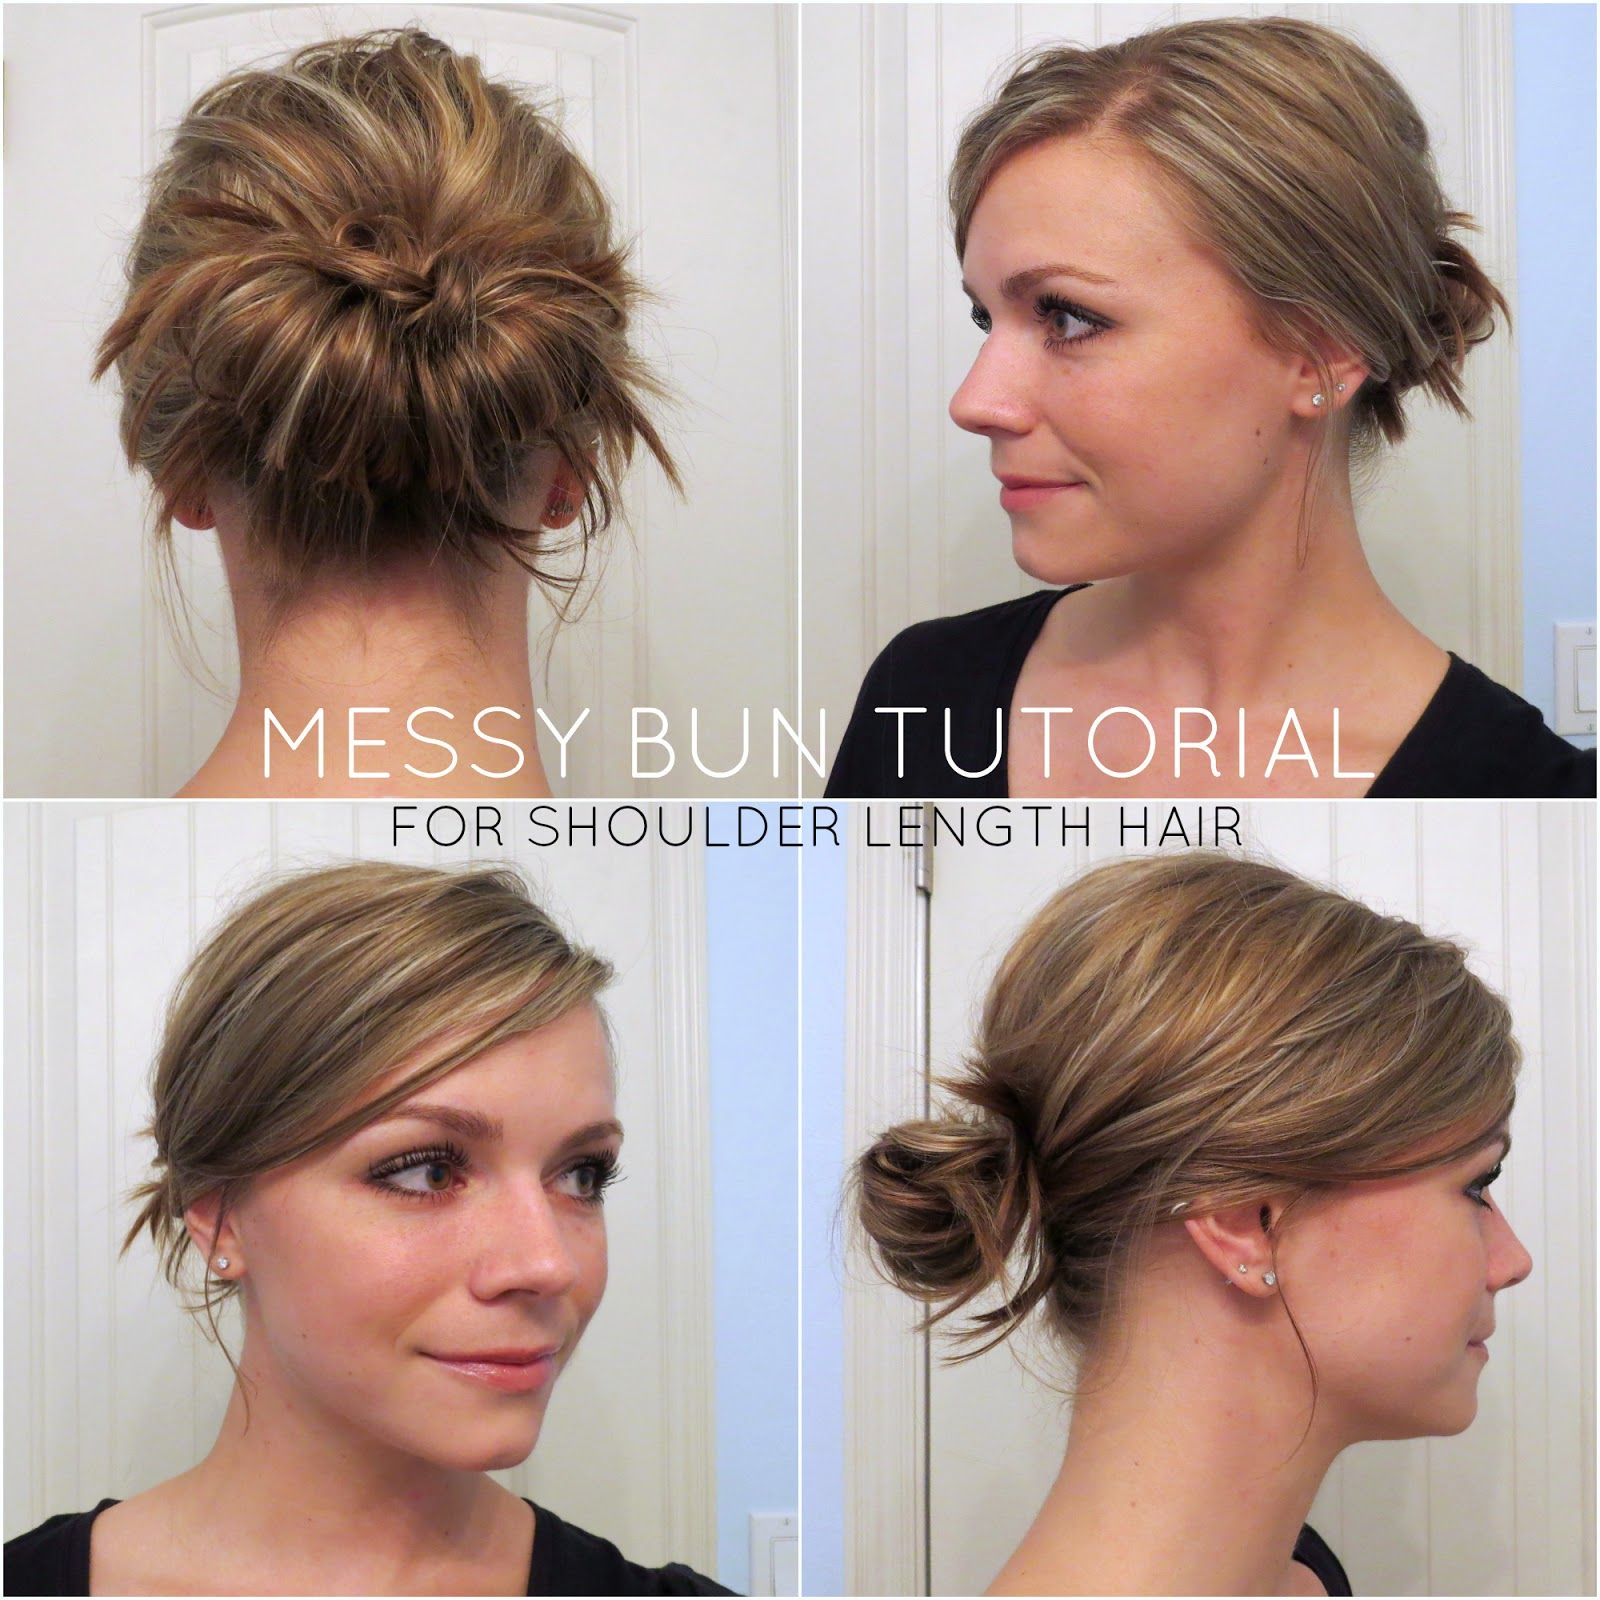 Diy Messy Buns That Only Take Minutes Messy Bun For Short Hair Hair Bun Tutorial Short Hair Bun